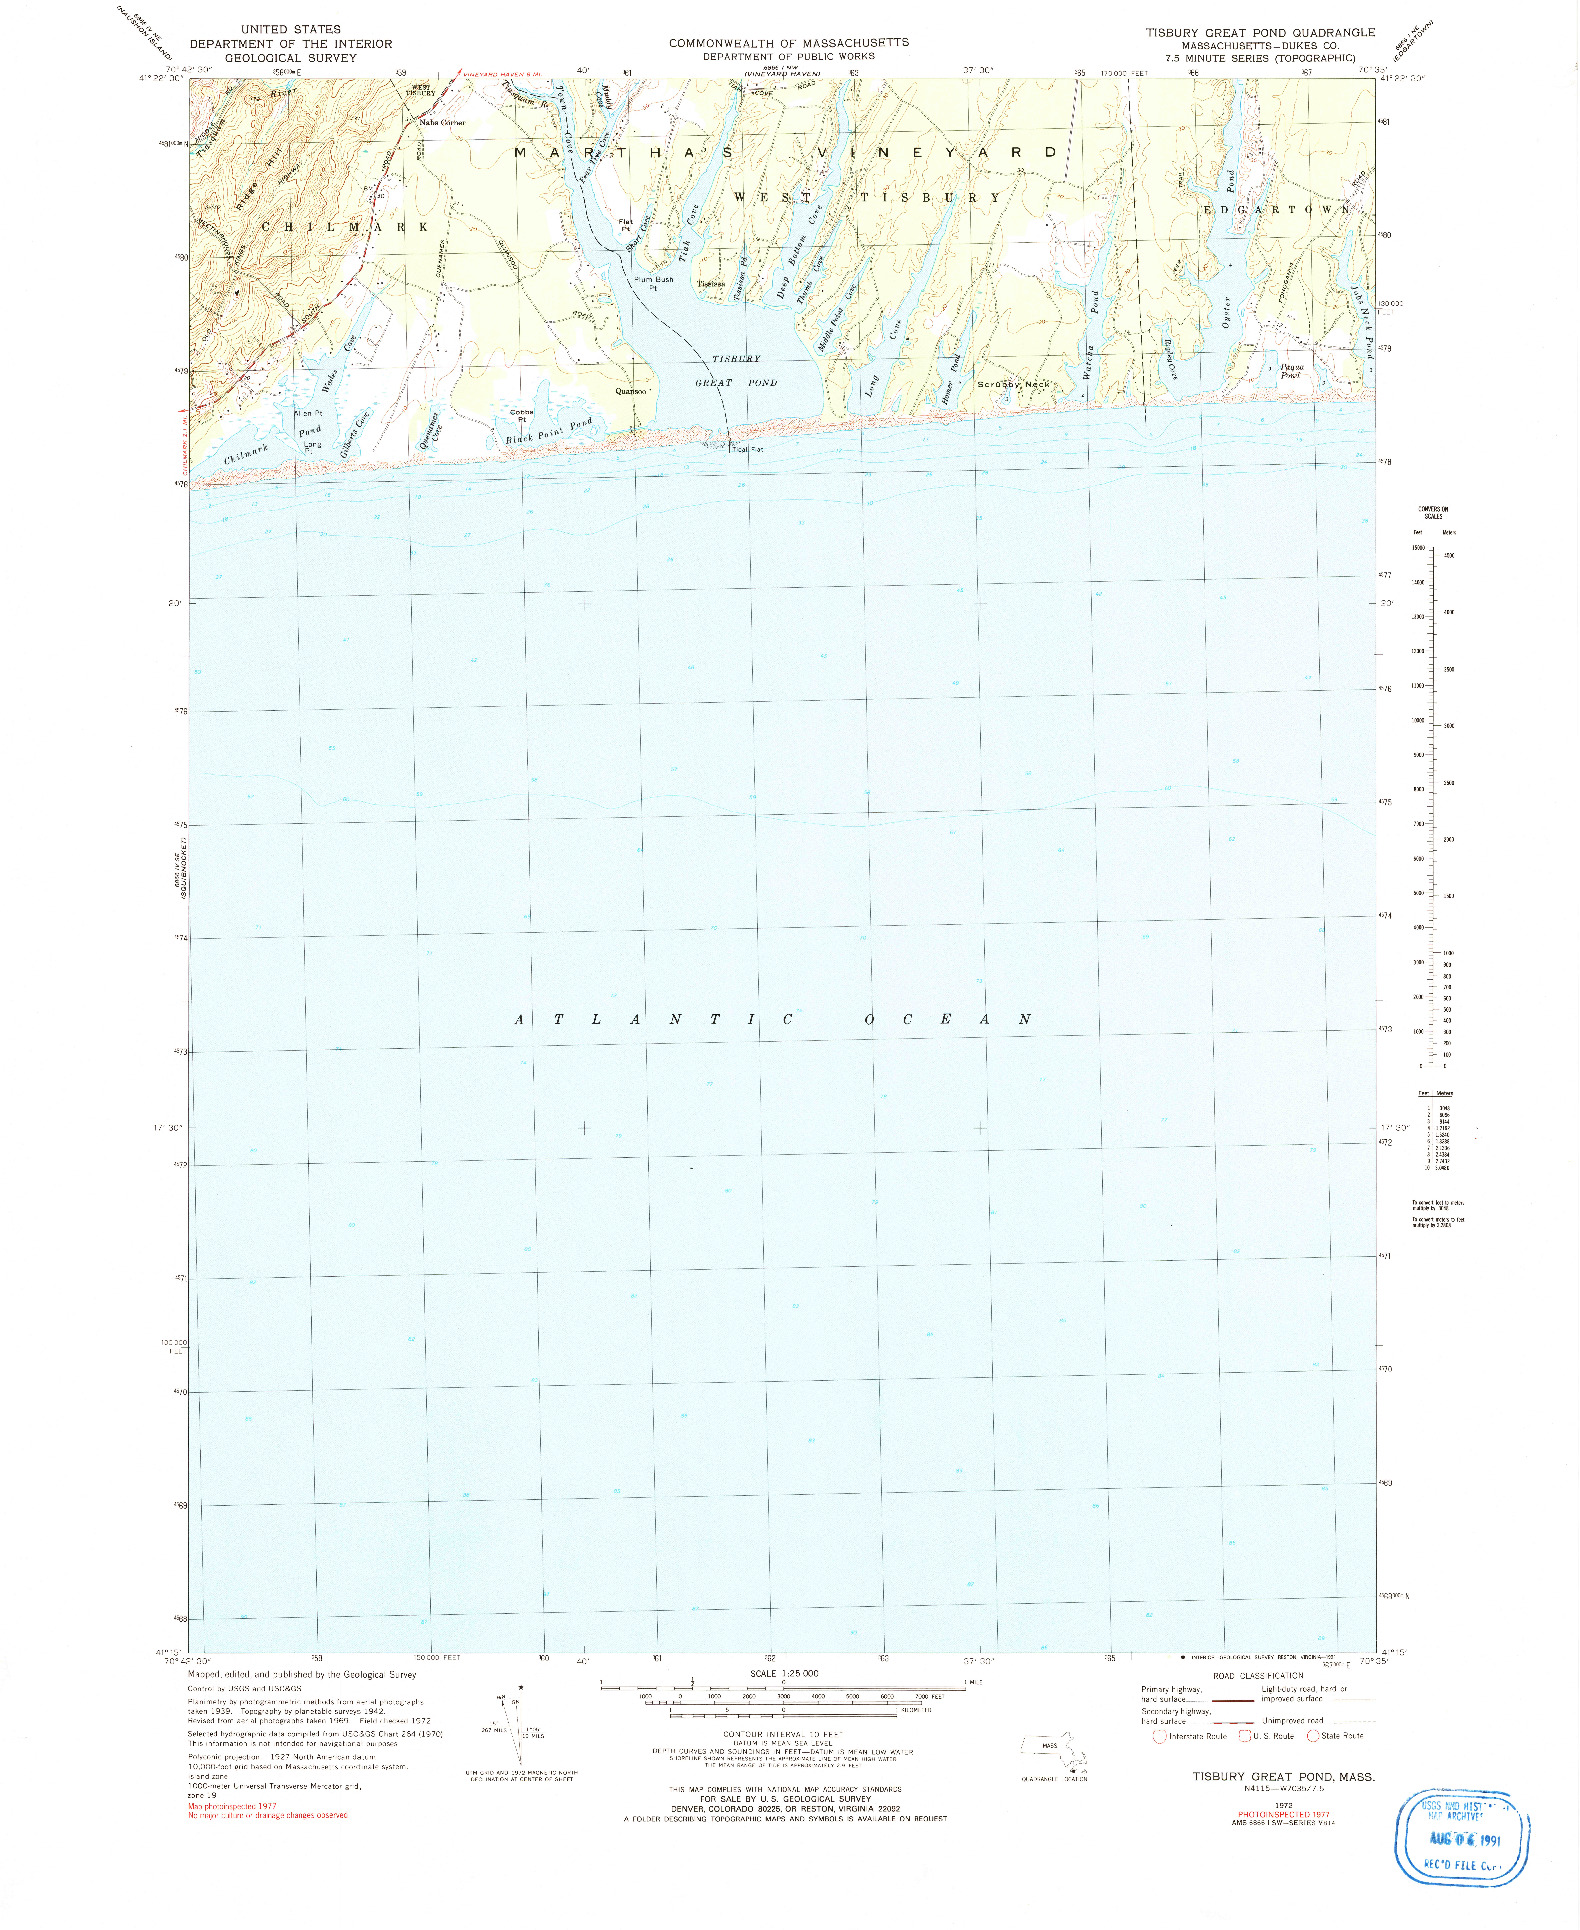 USGS 1:25000-SCALE QUADRANGLE FOR TISBURY GREAT POND, MA 1972